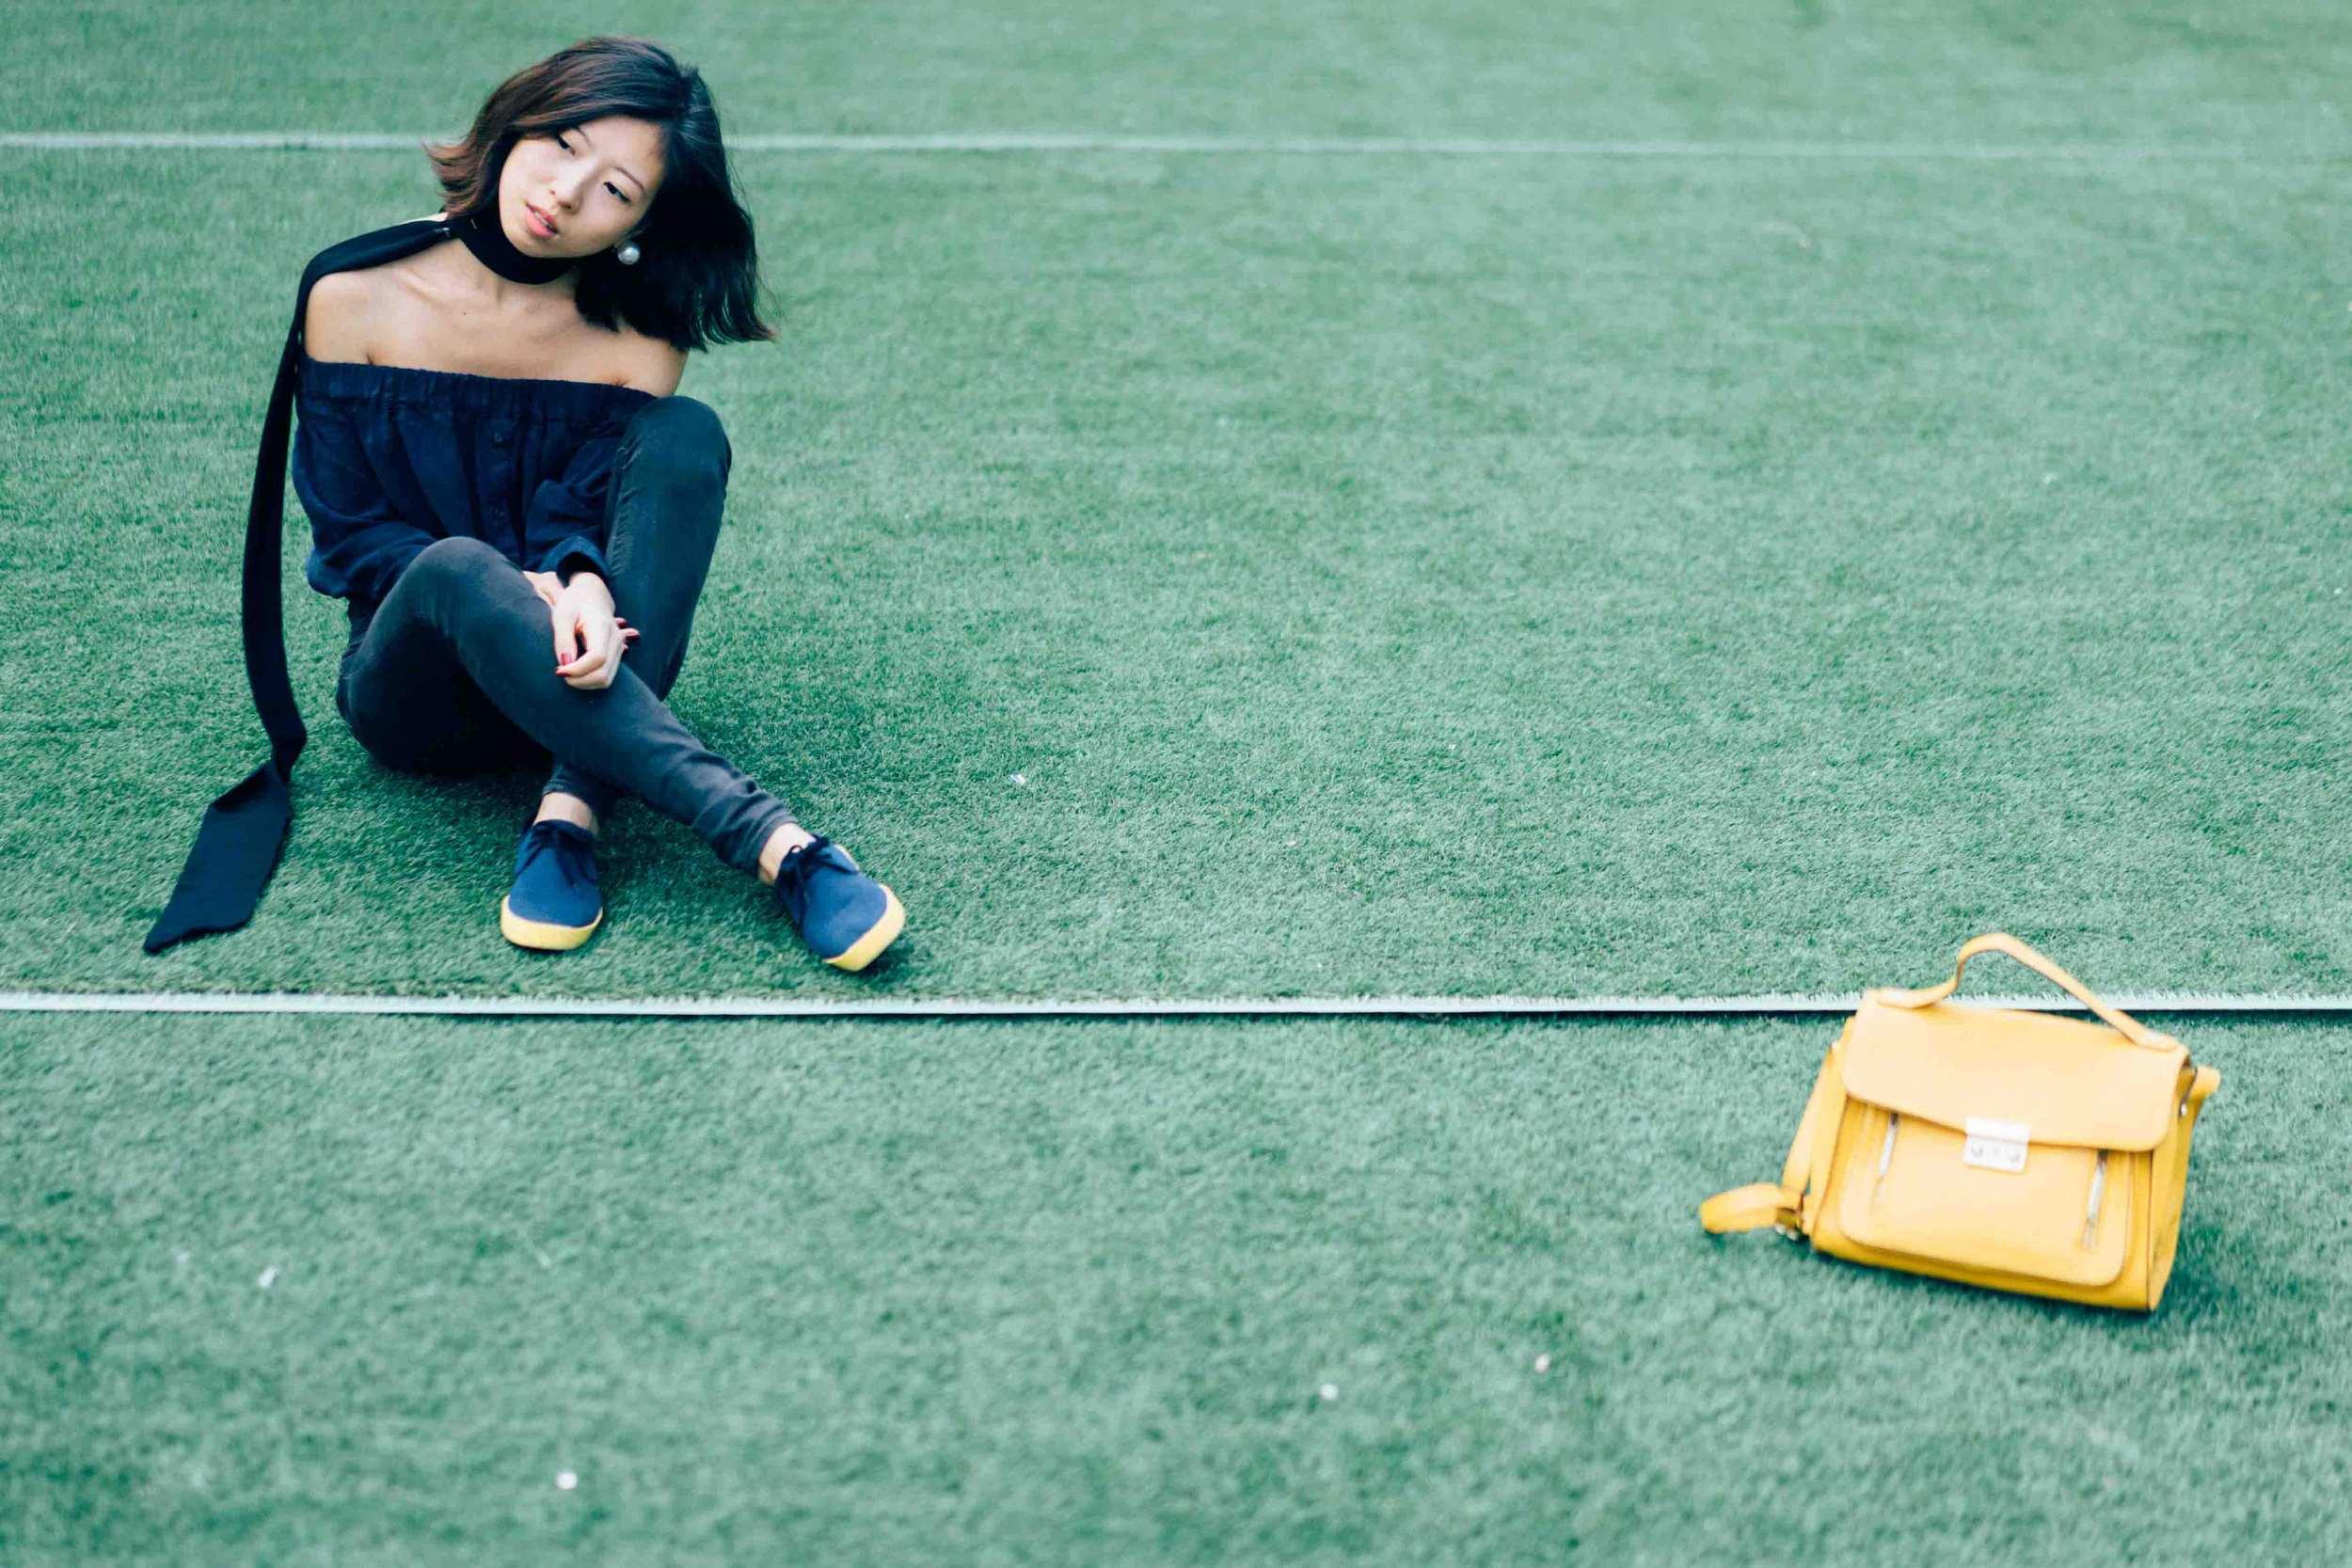 Accessorize  Earrings  |  Z    ara  Scarf |     H&M  Top |  H&M  Jeans |    O    li13    Shoes  |   Phillip Lim x Target   Bag